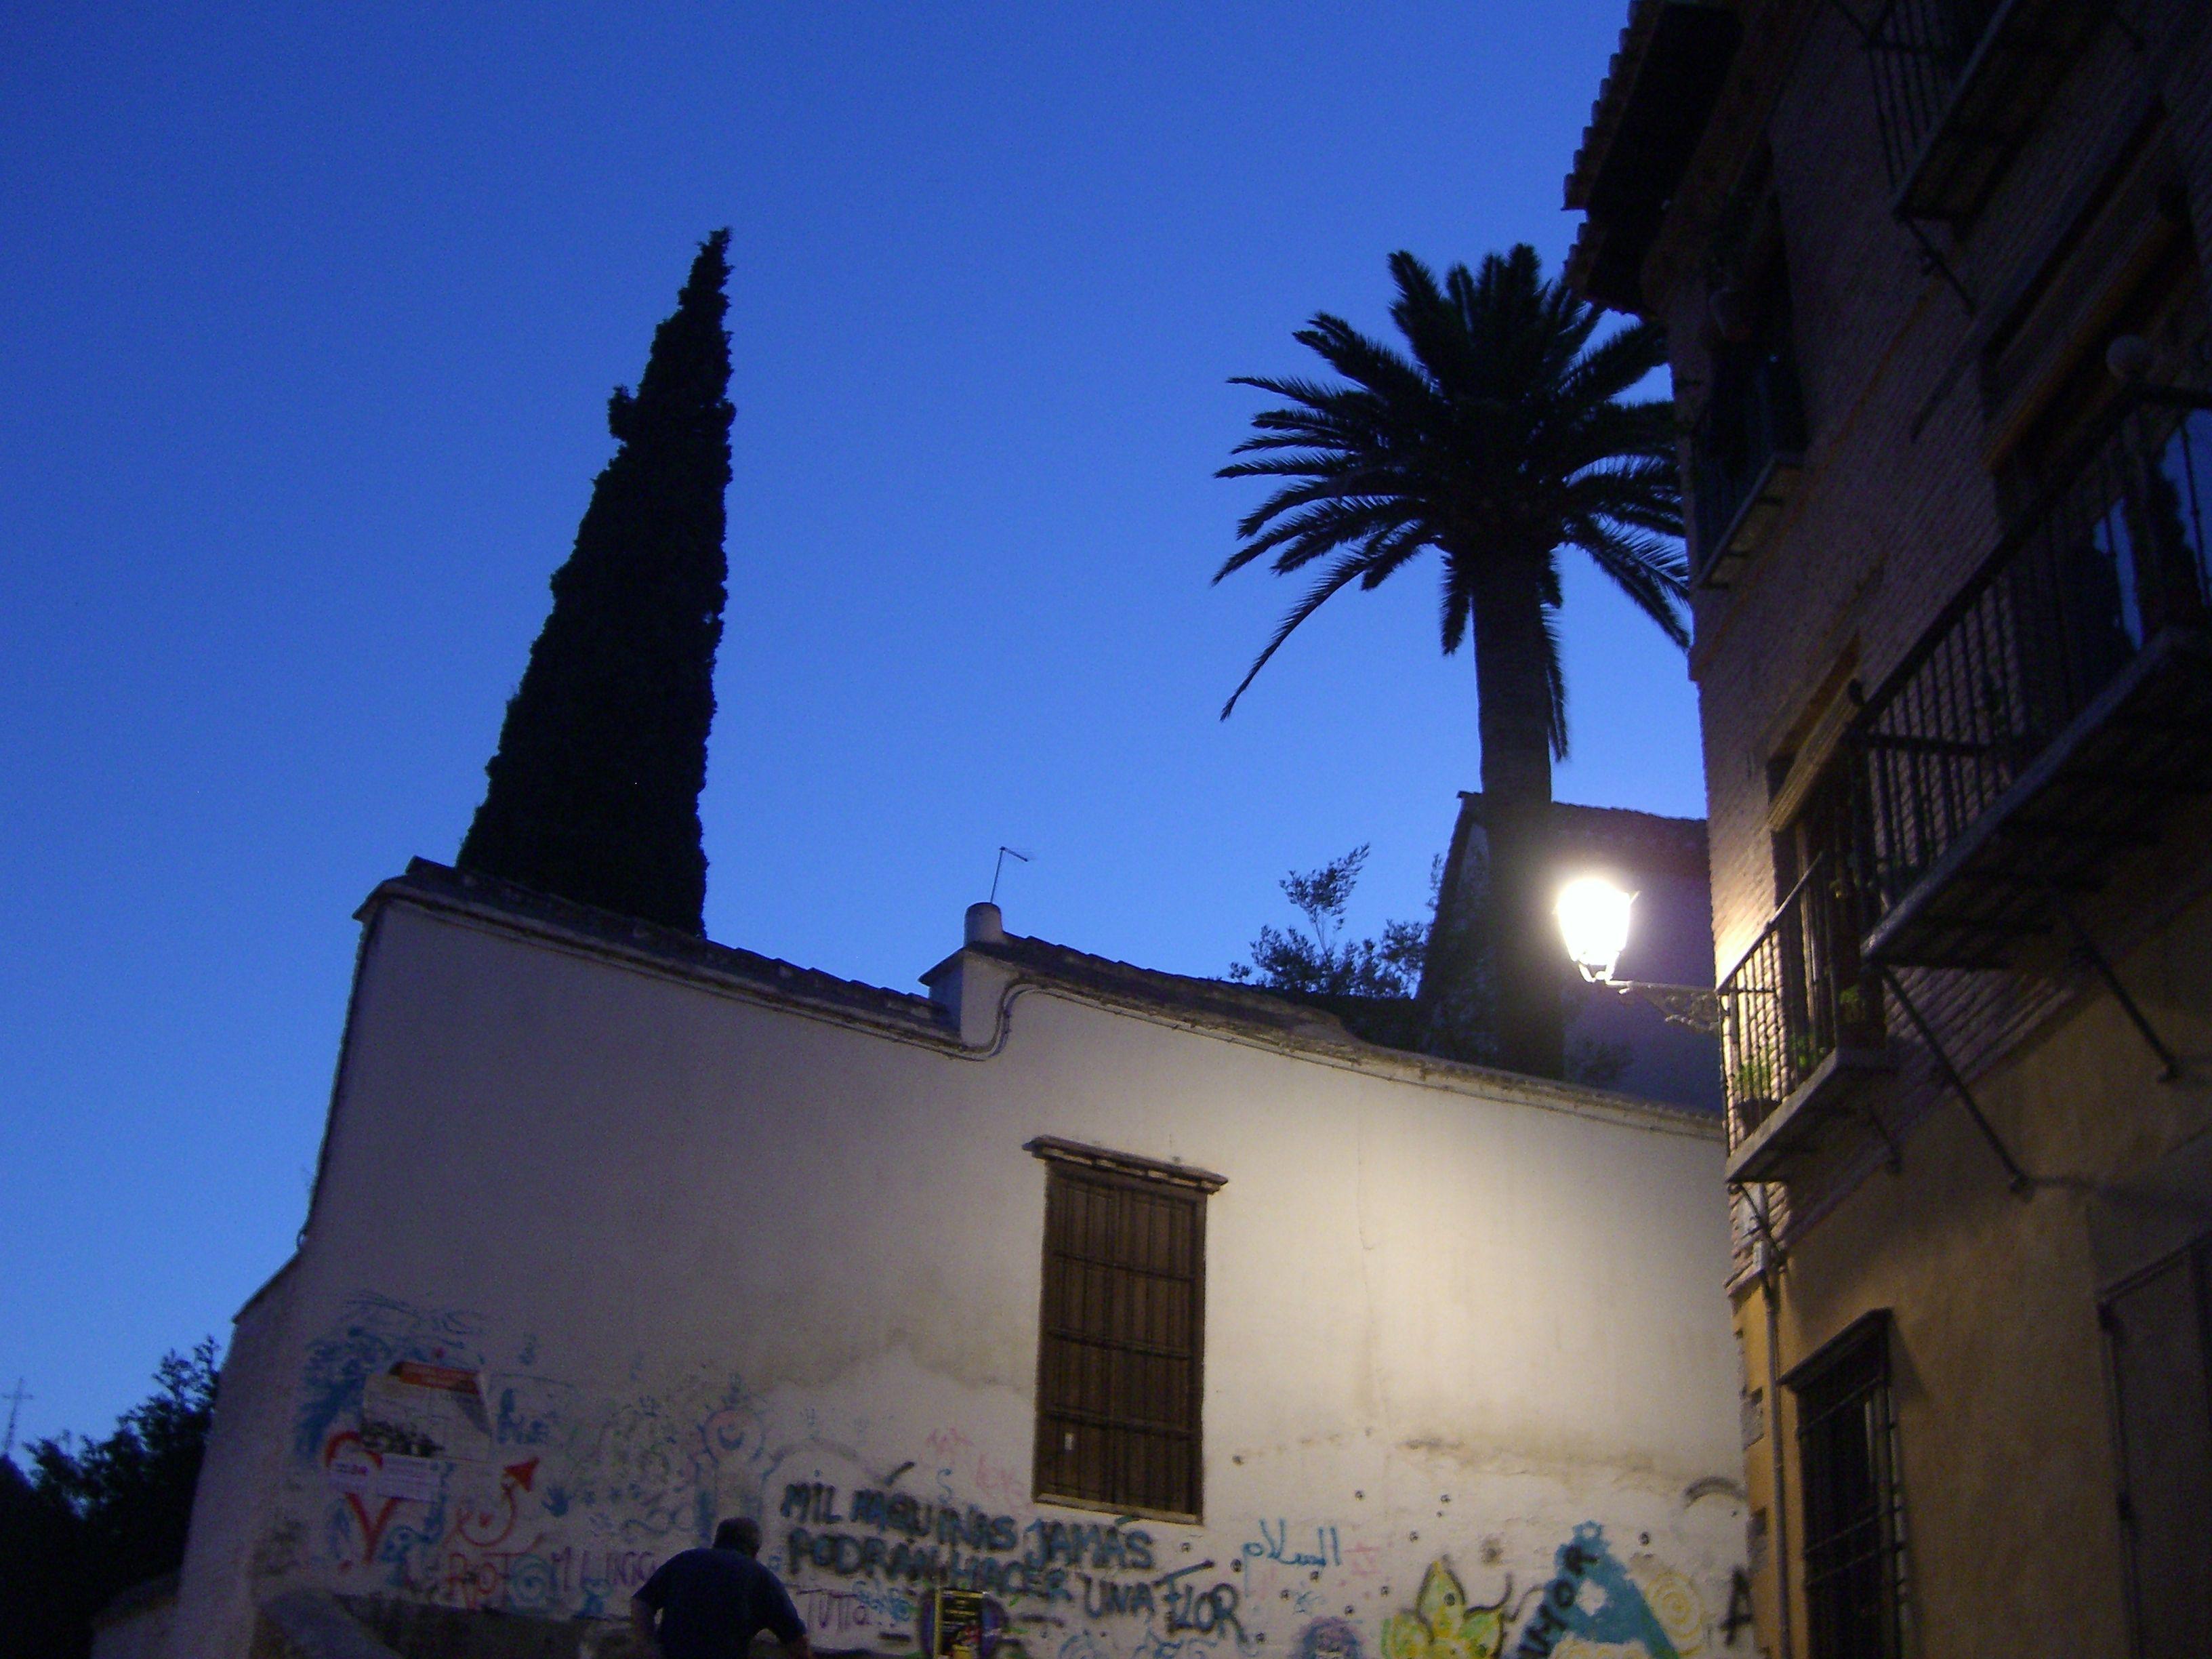 Evening in Albaicin, Granada